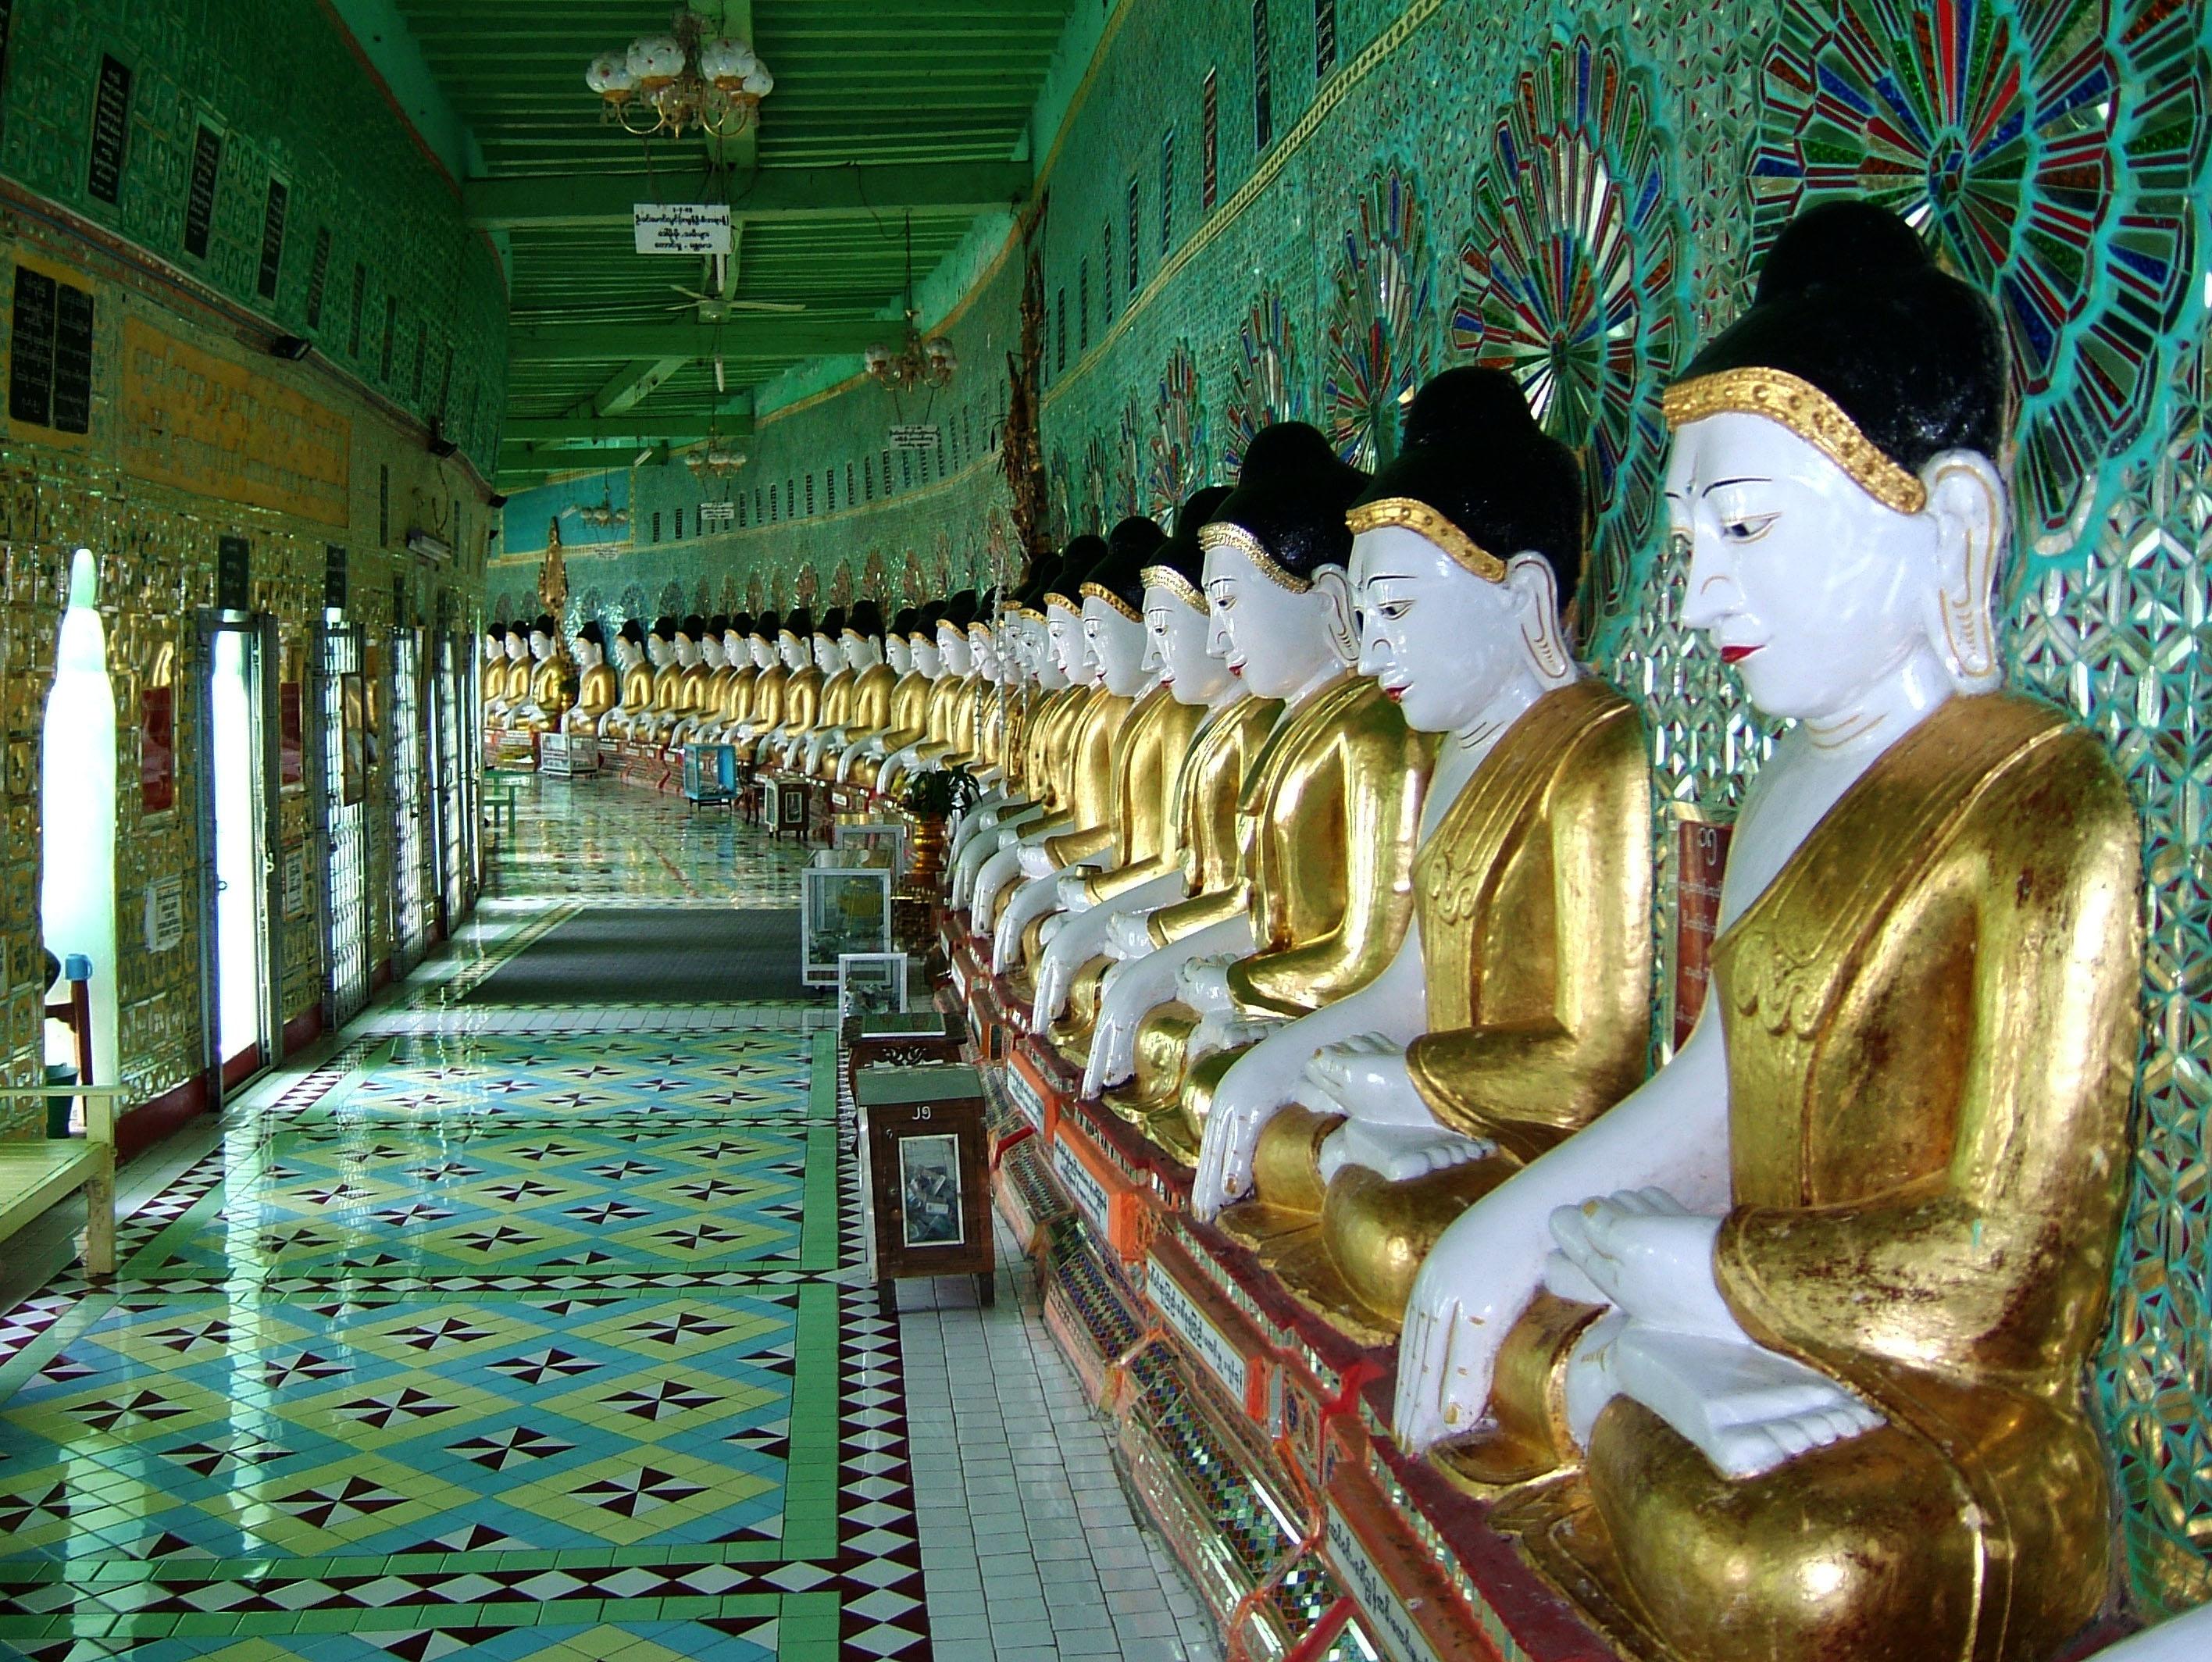 Sagaing U Min Thounzeh Pagoda many faces of the Buddha Dec 2000 05